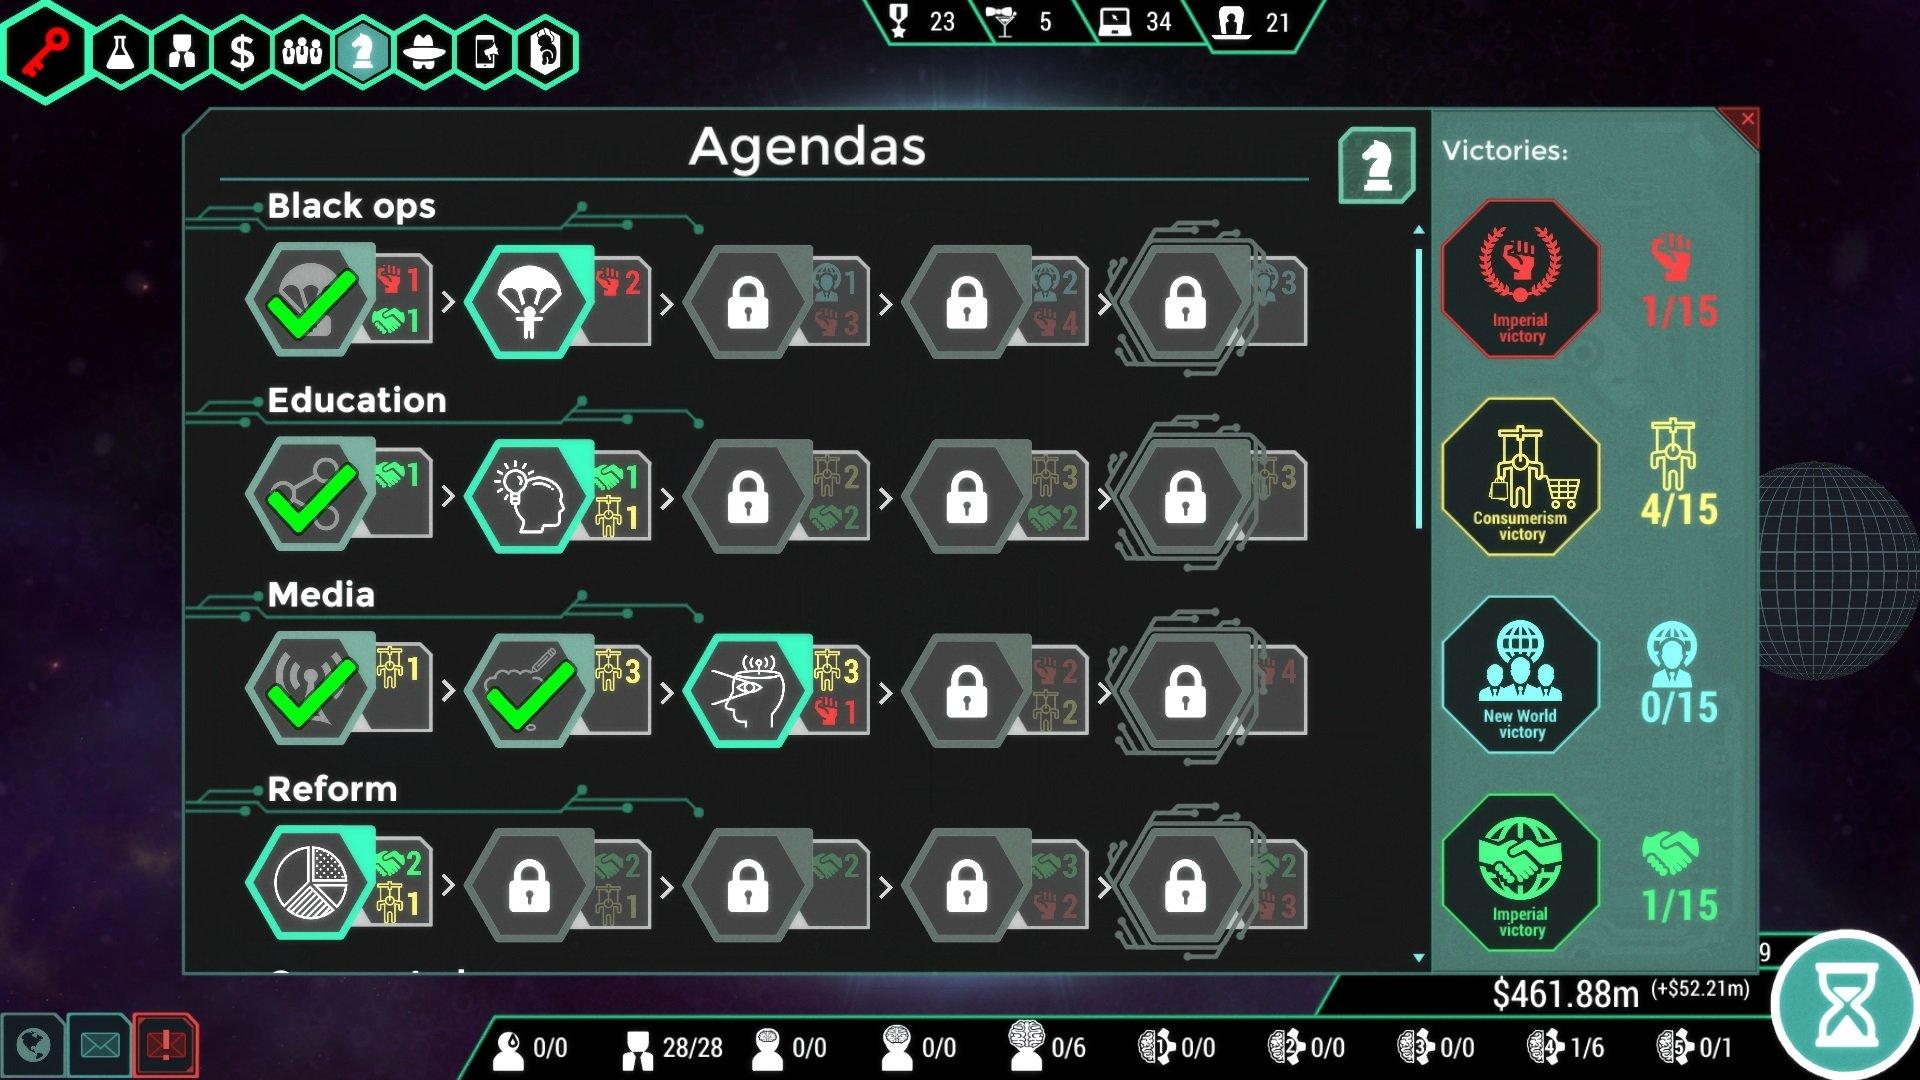 Spinnortality_Agenda